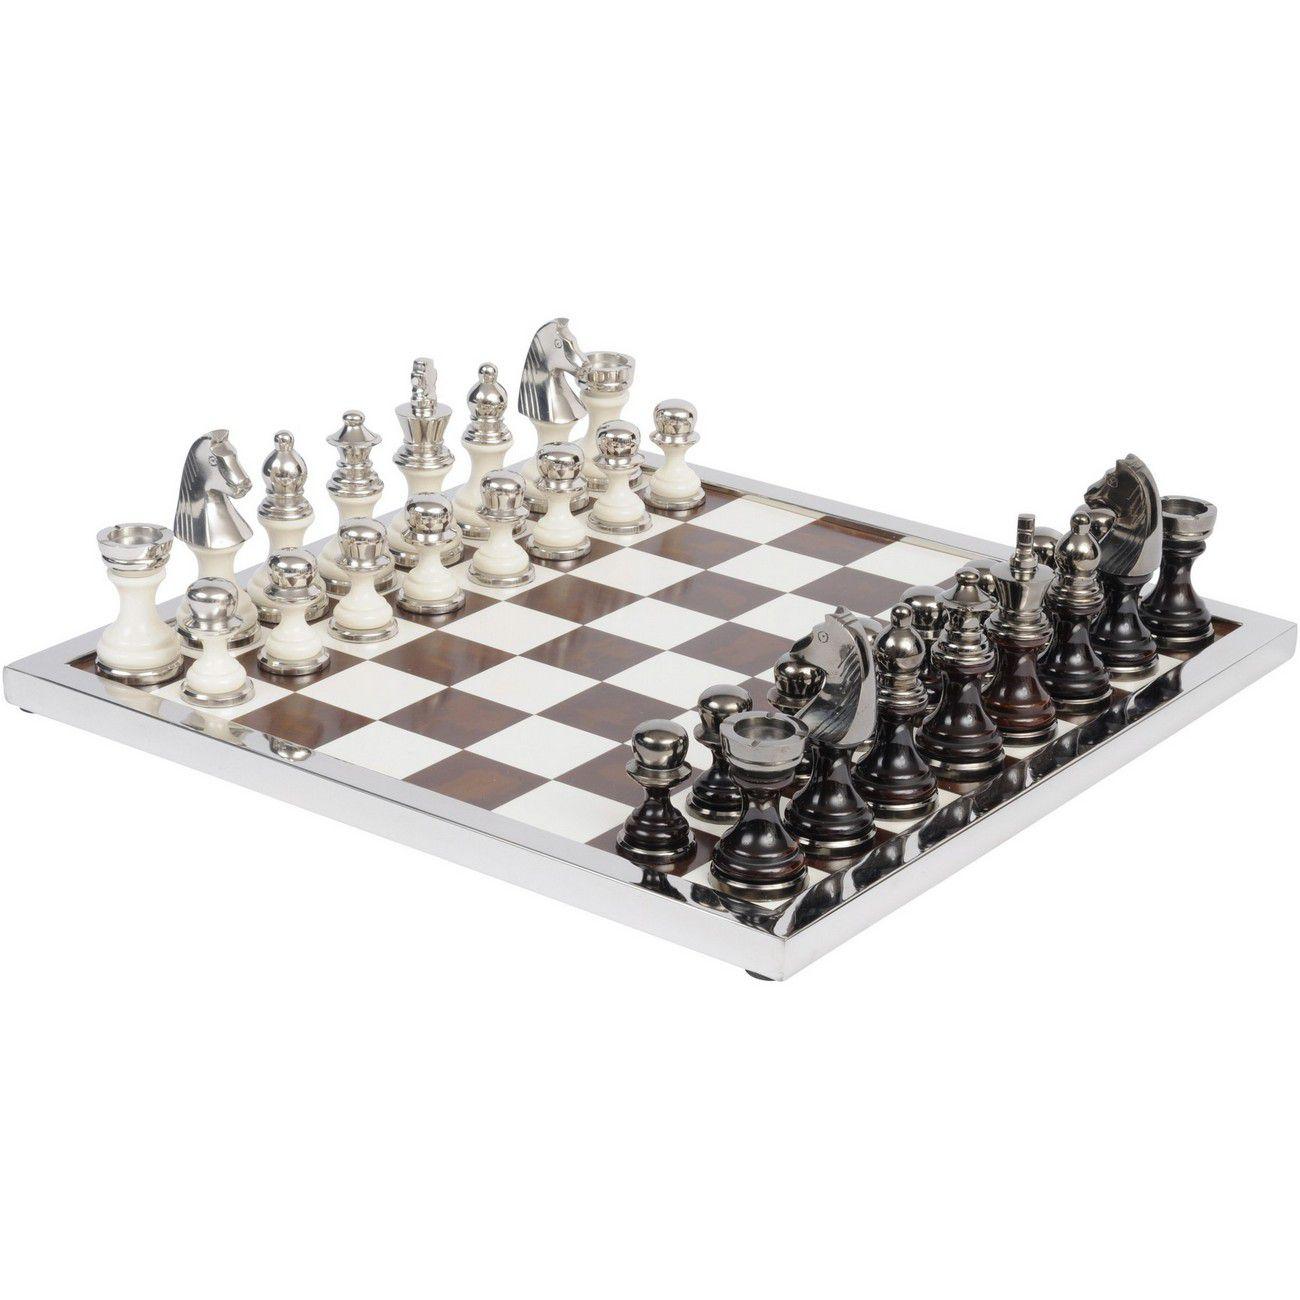 Oversized Chess Set